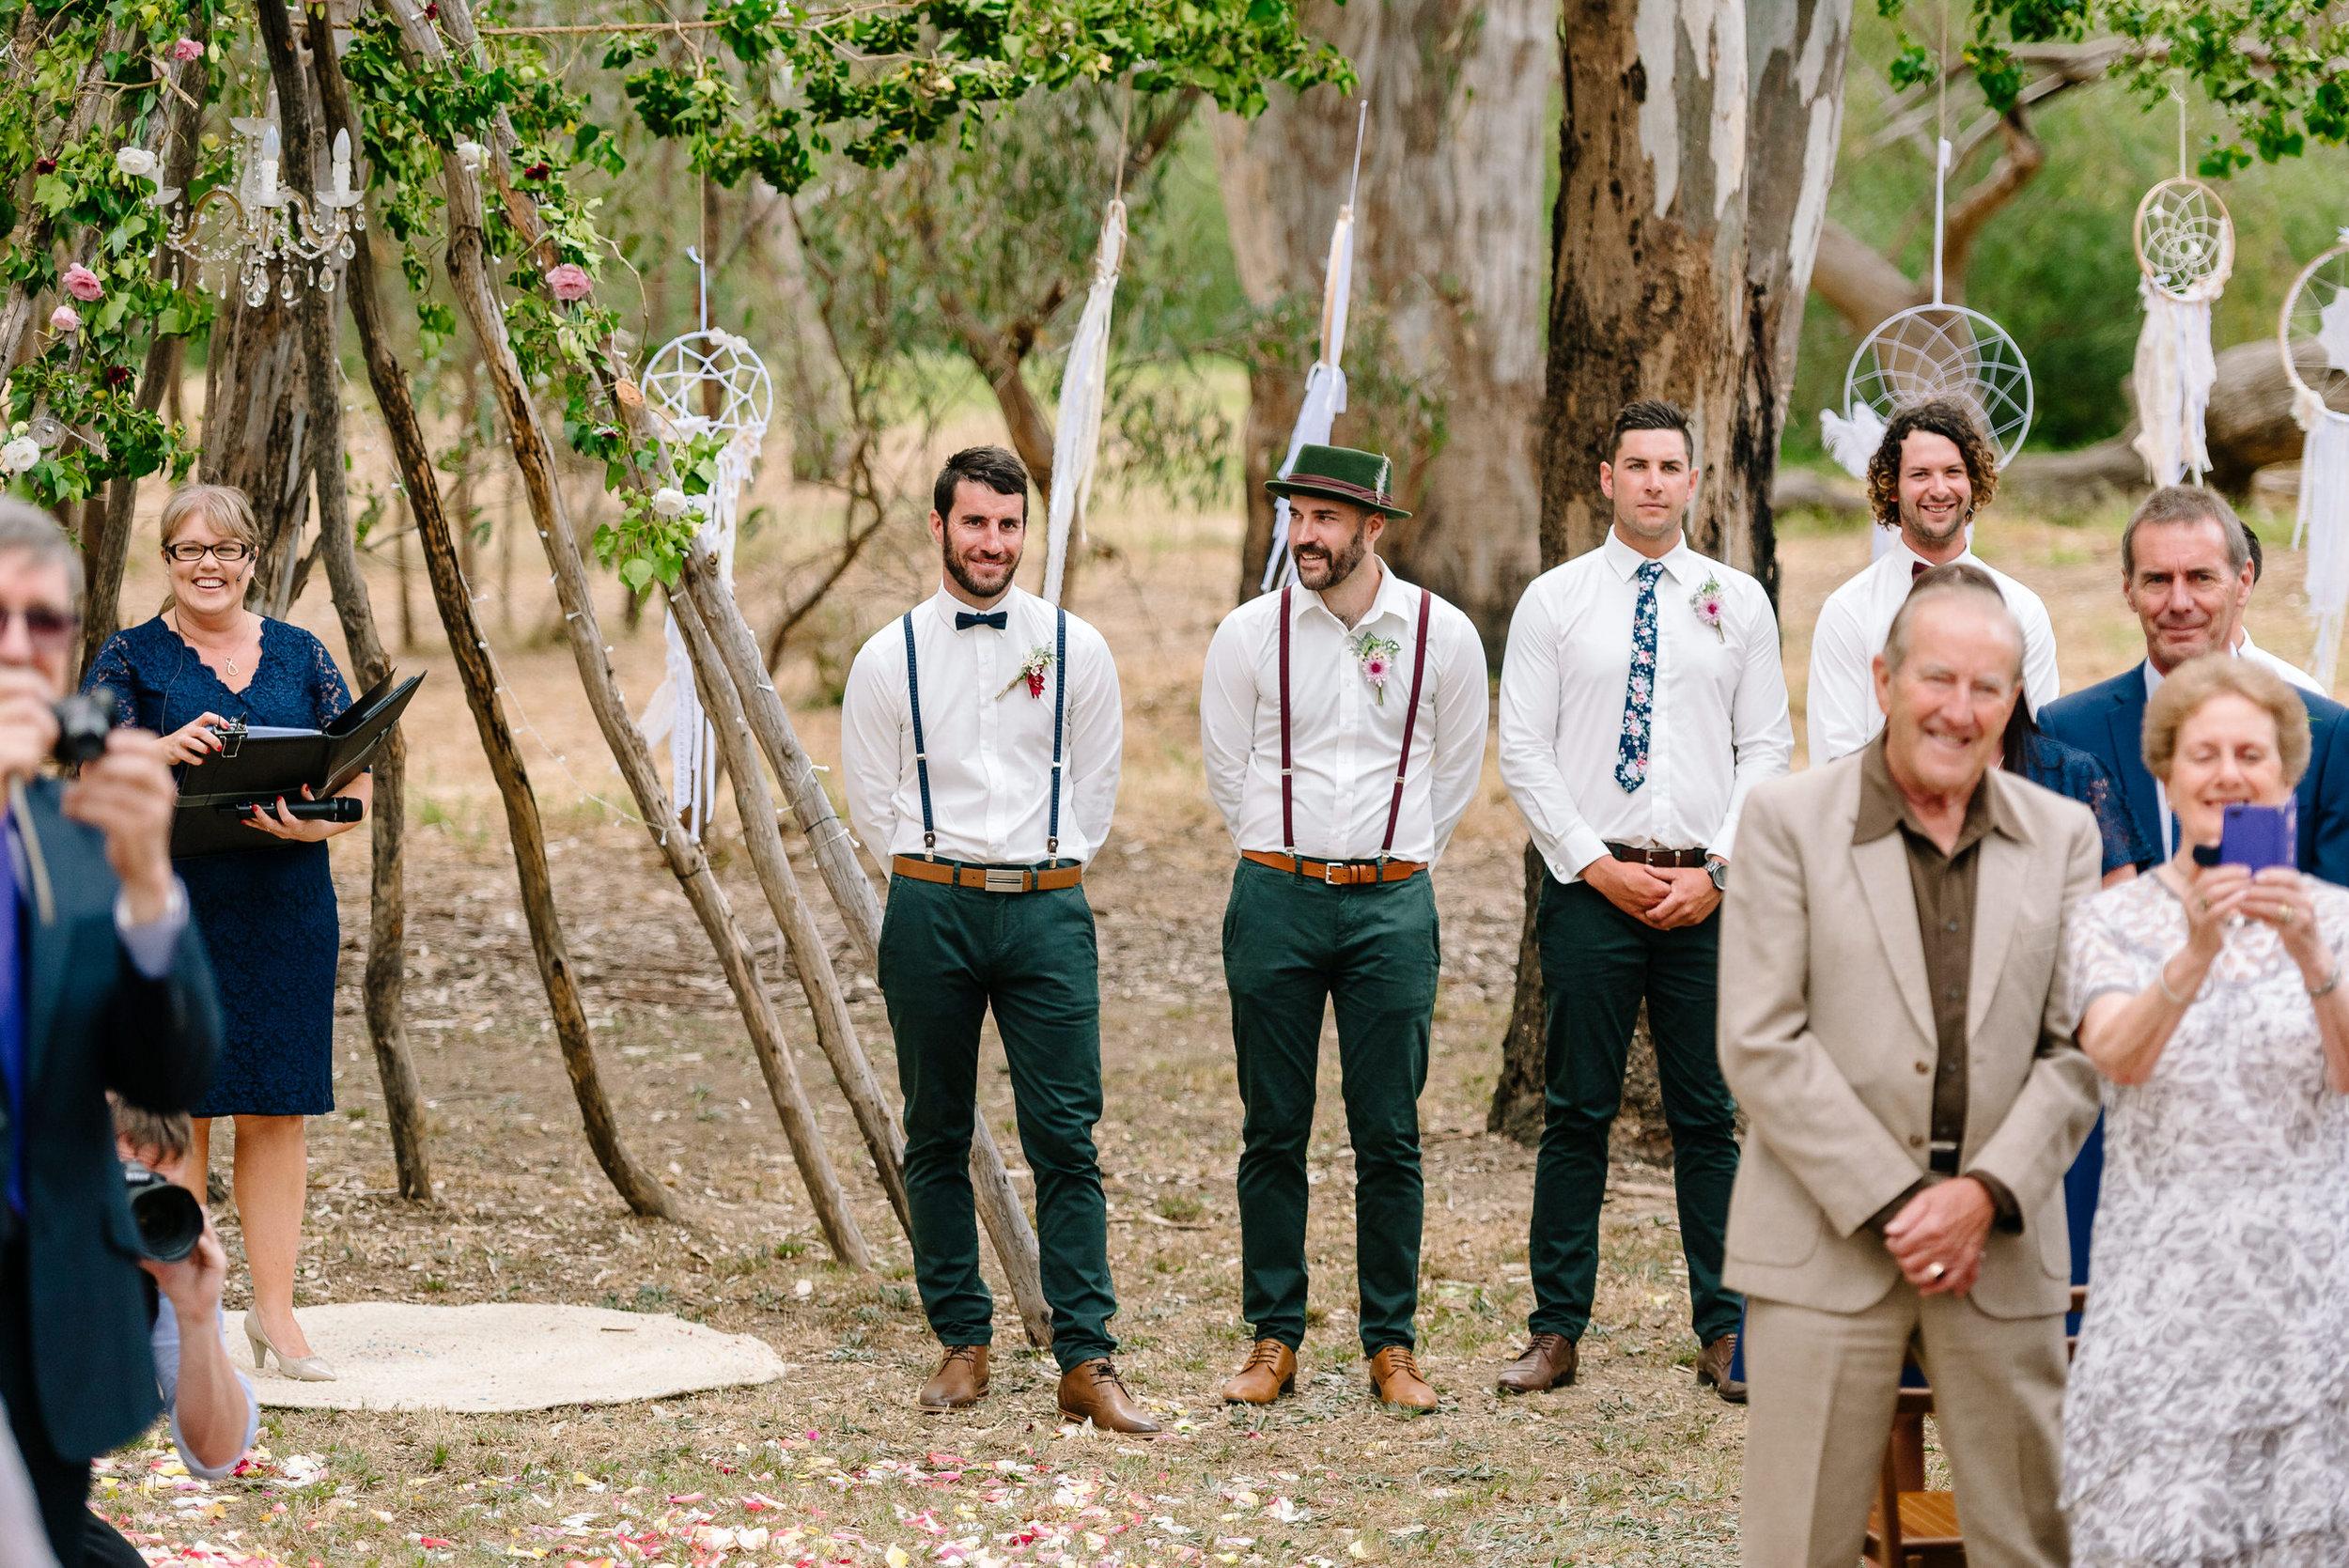 Justin_And_Jim_Photography_Backyard_Wedding166.JPG